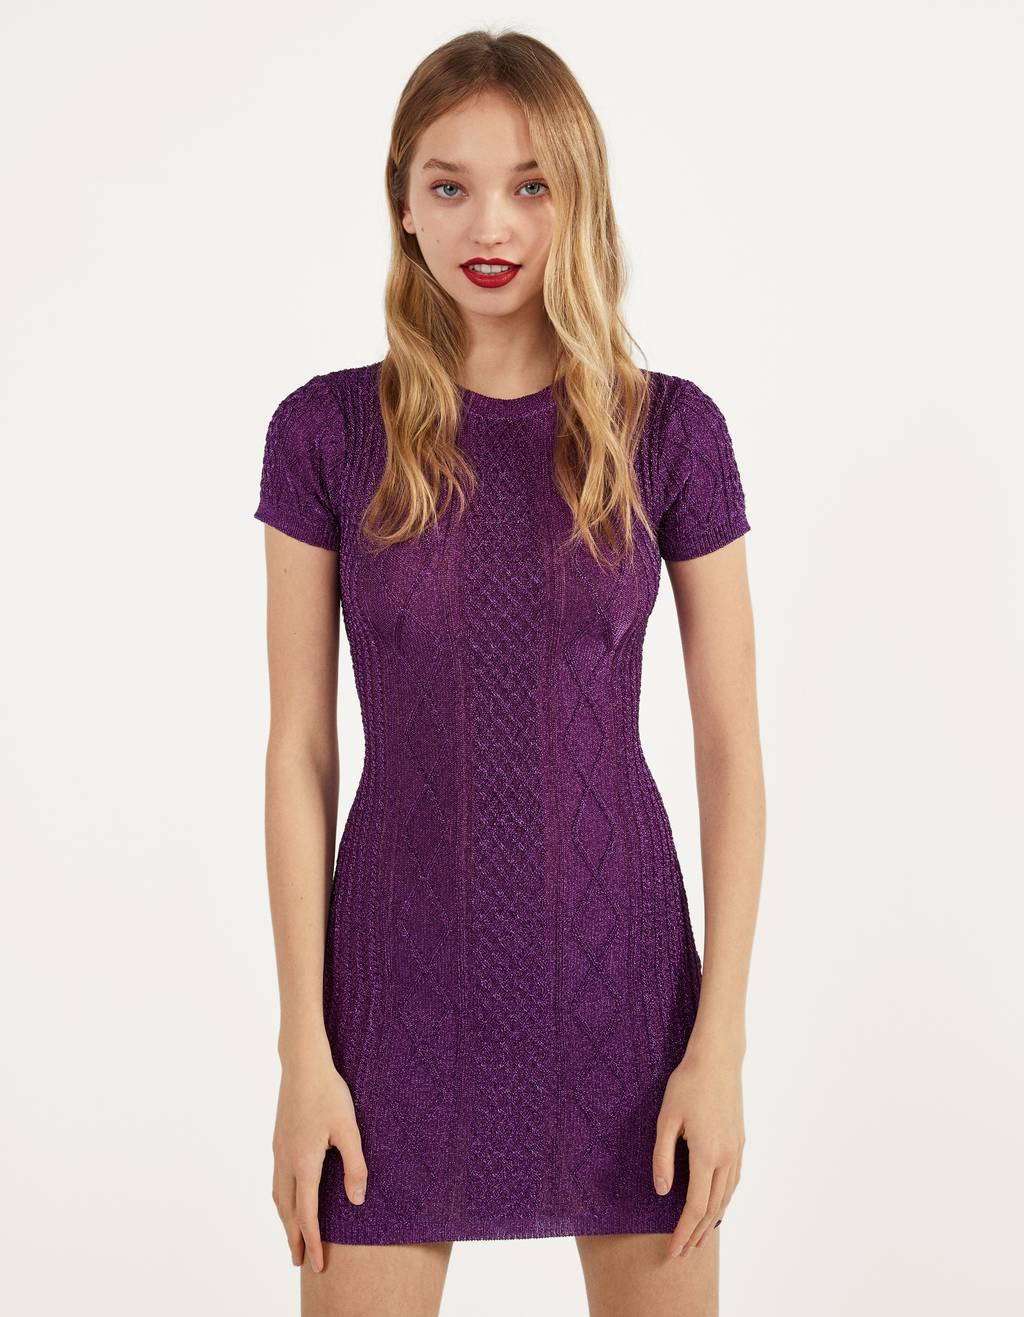 Knit dress with metallic thread